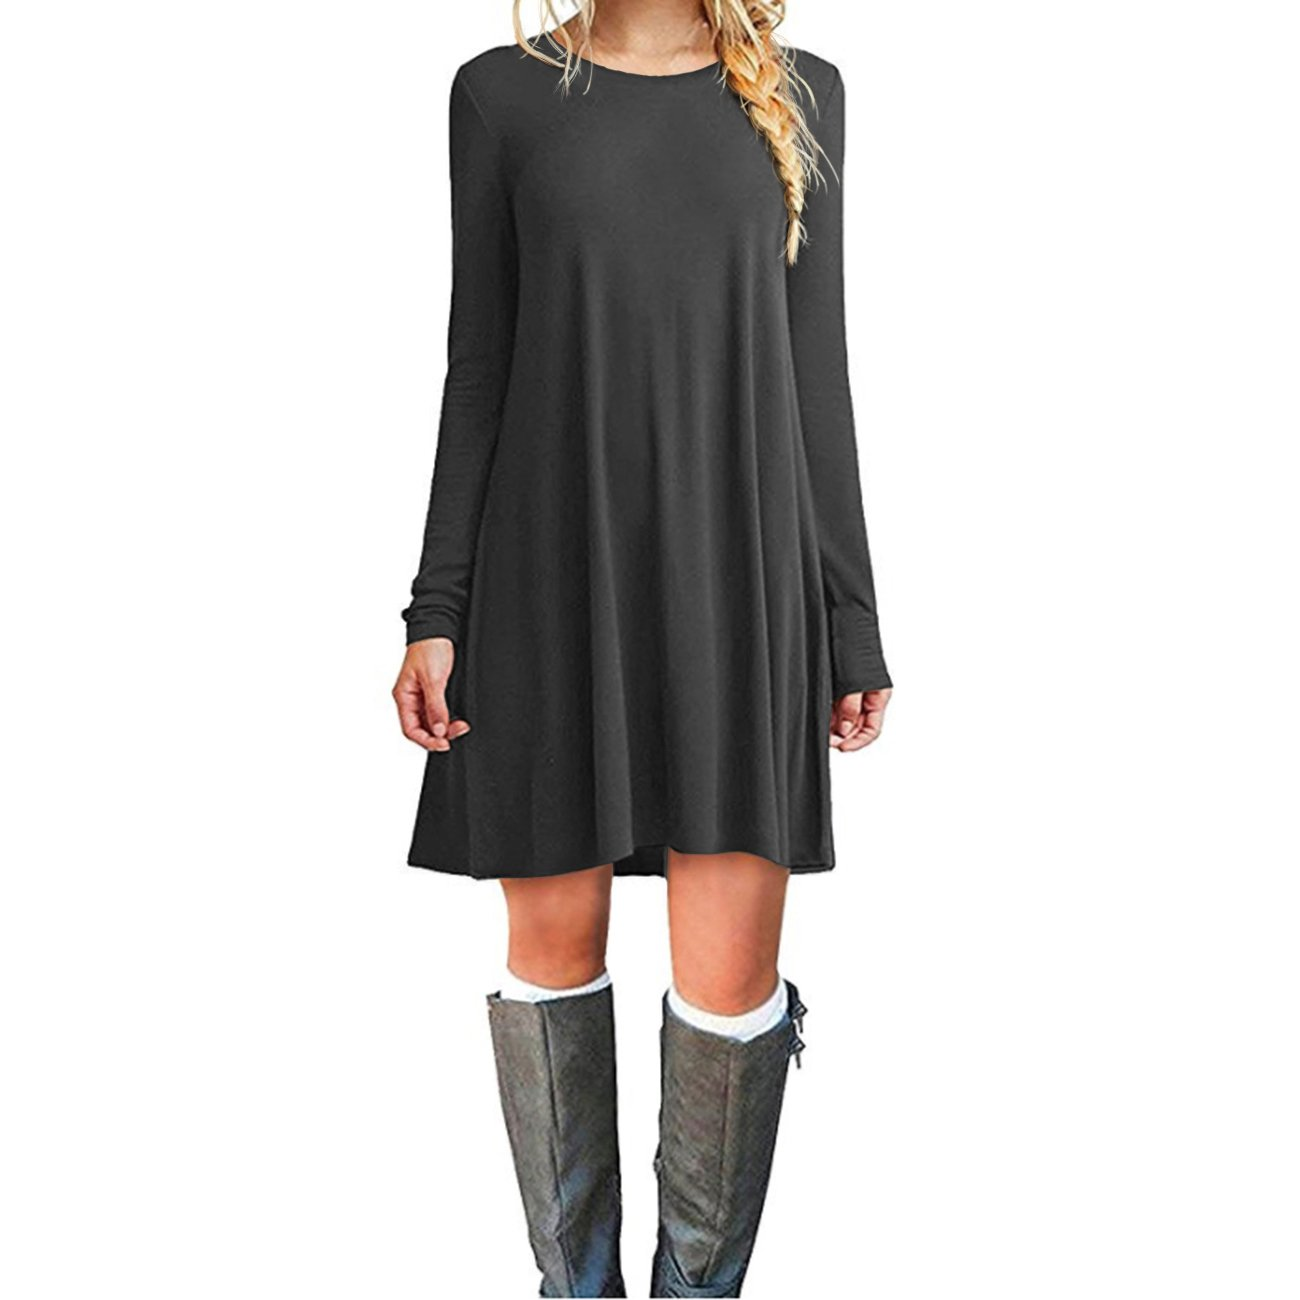 Cnokzol Women Long Sleeve Flowy Tunic Pockets Dress Plain Swing Loose T-Shirt Dress(S,Grey)